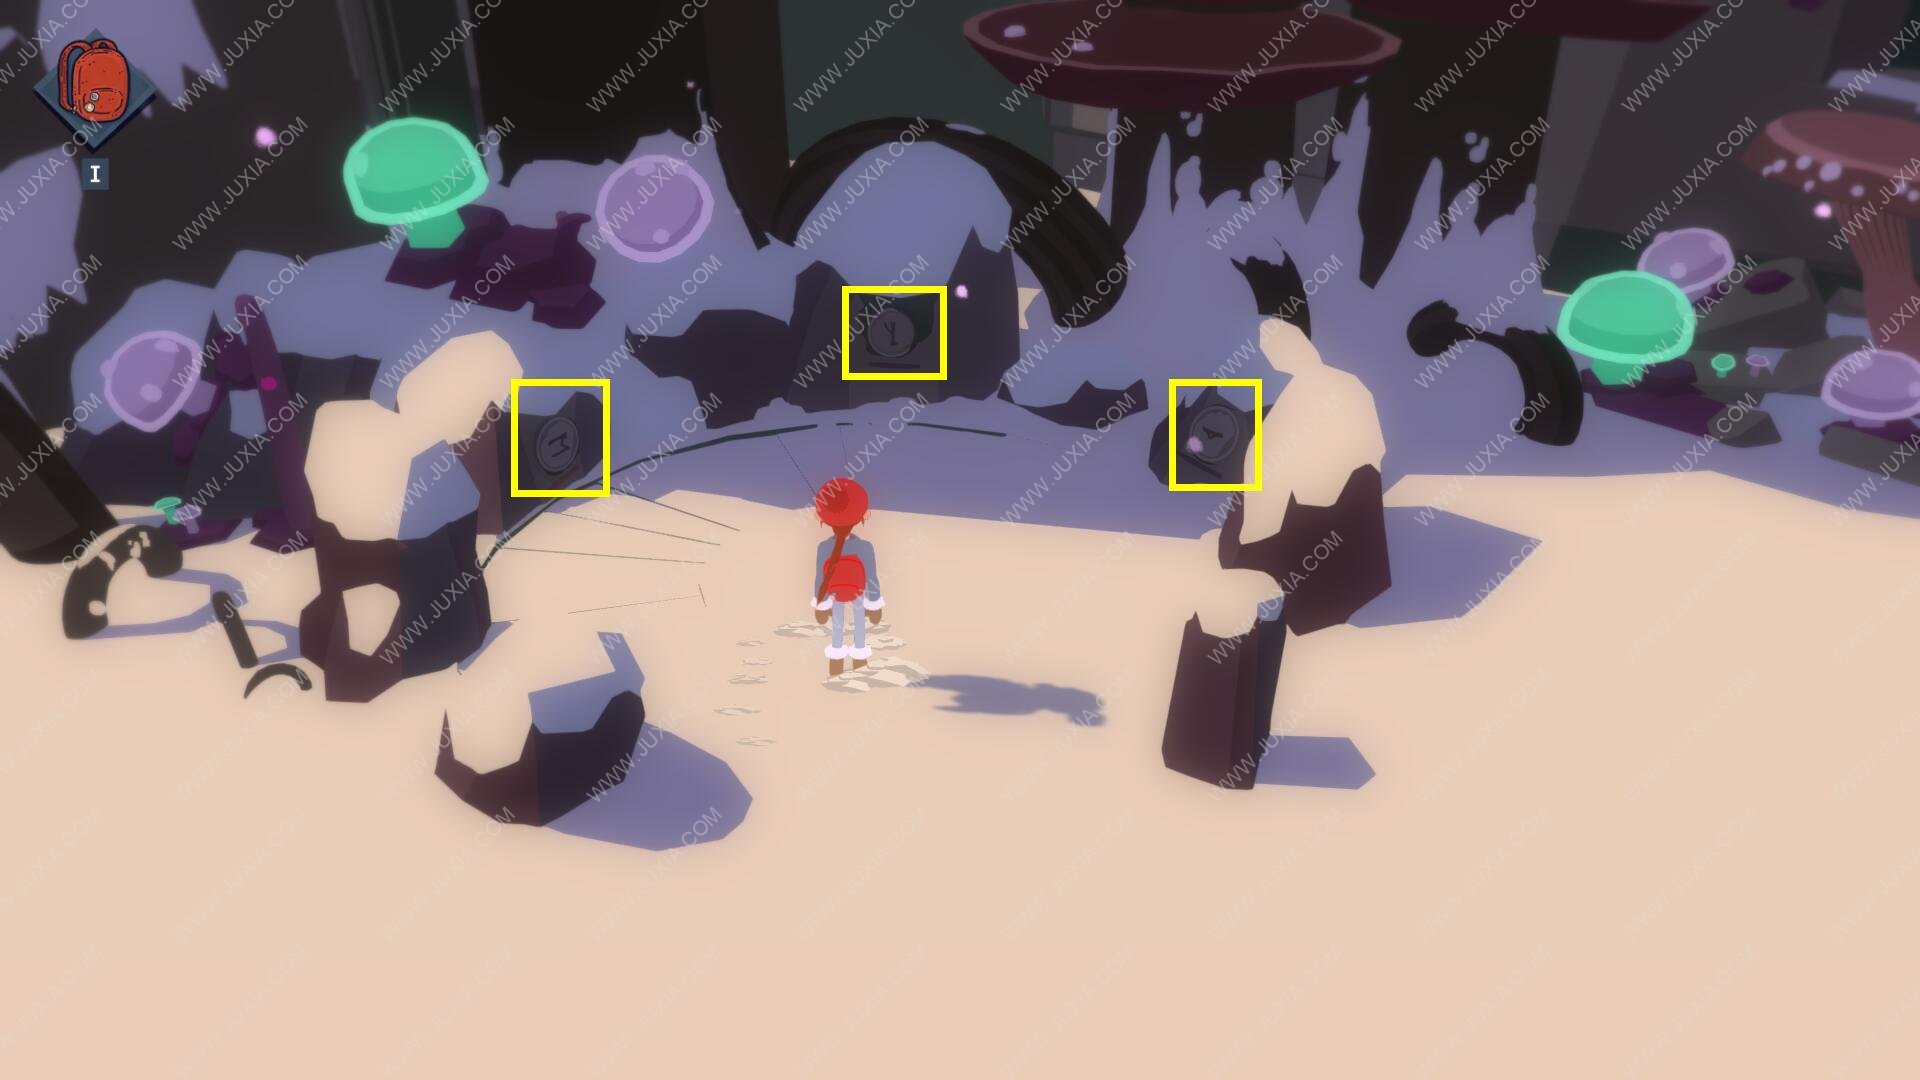 Röki完整攻略 第二章攻略上狼雕像谜题怎么过